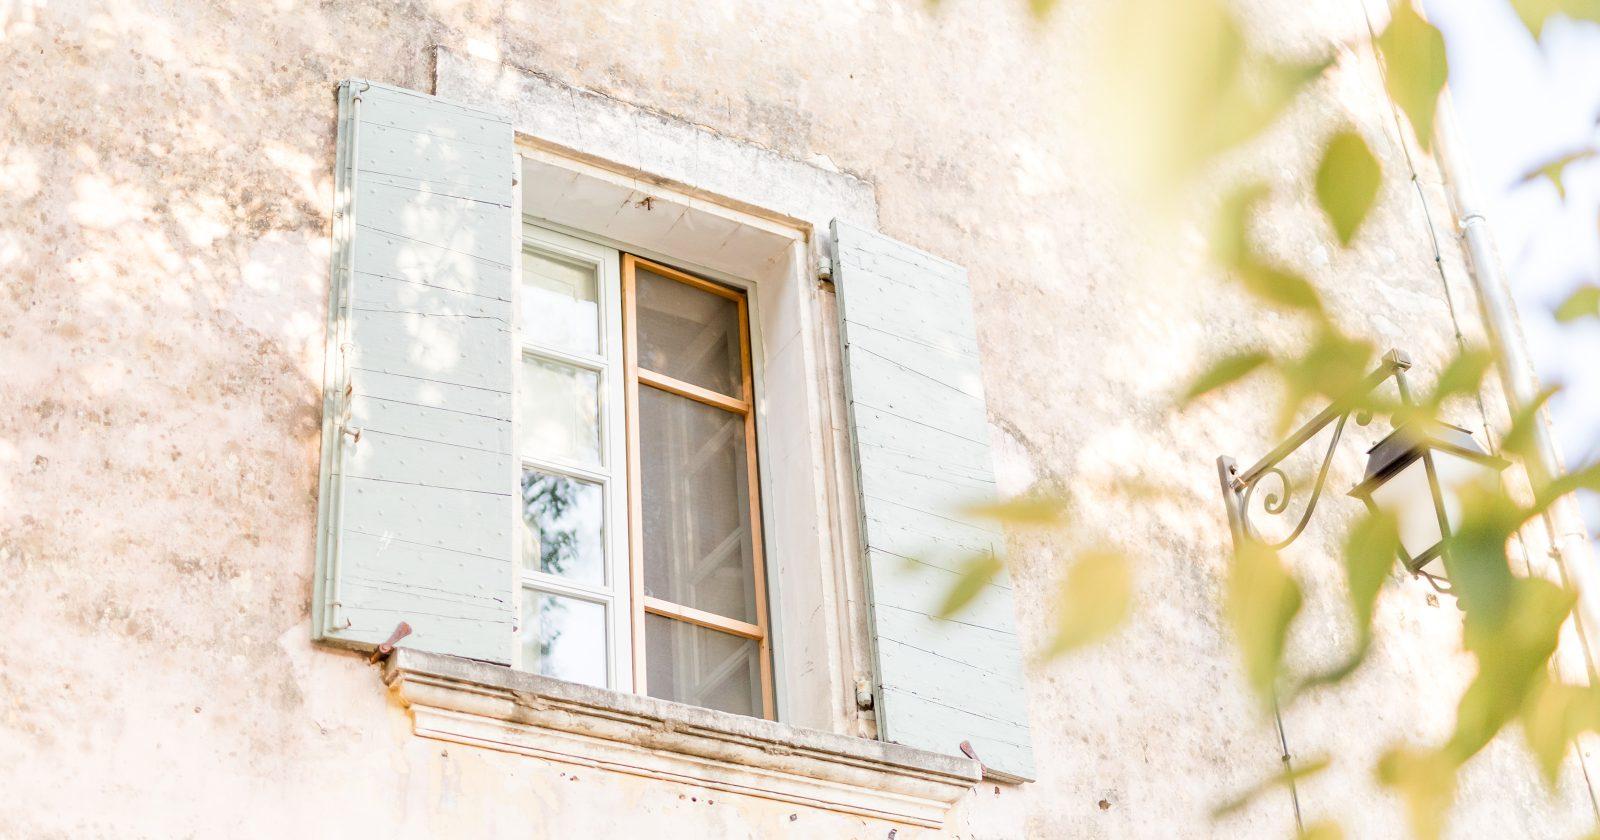 Provence, France, Part 1: Goult